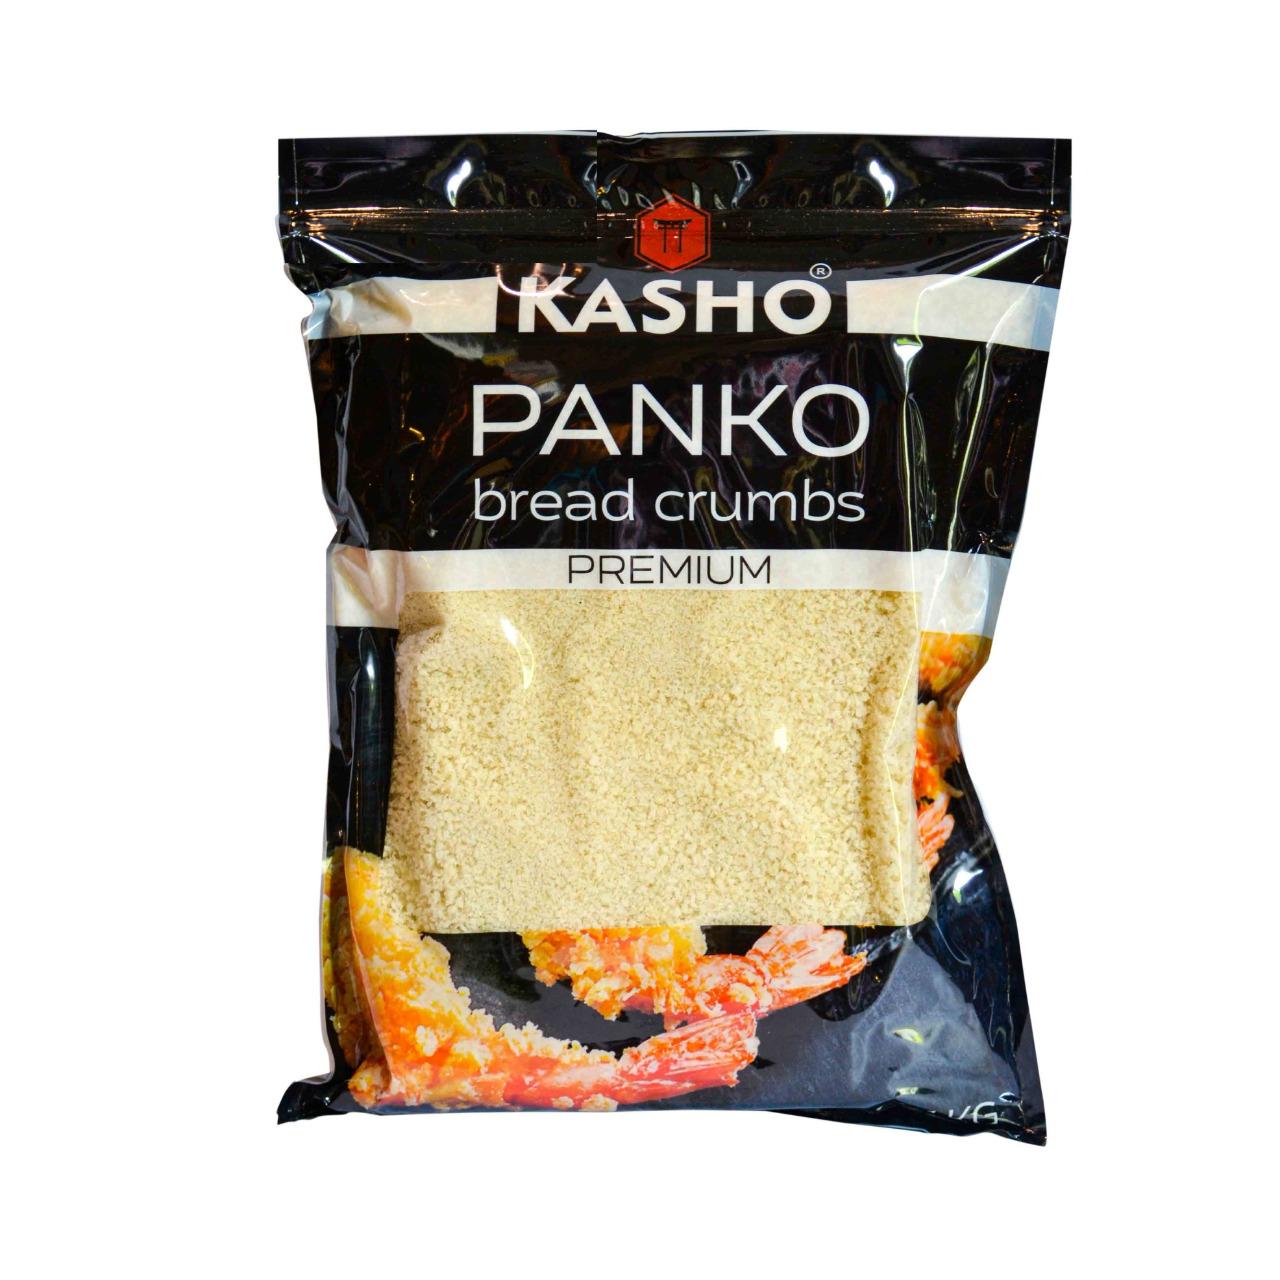 Qızartma üçün suxari Panko Kasho 1kg.